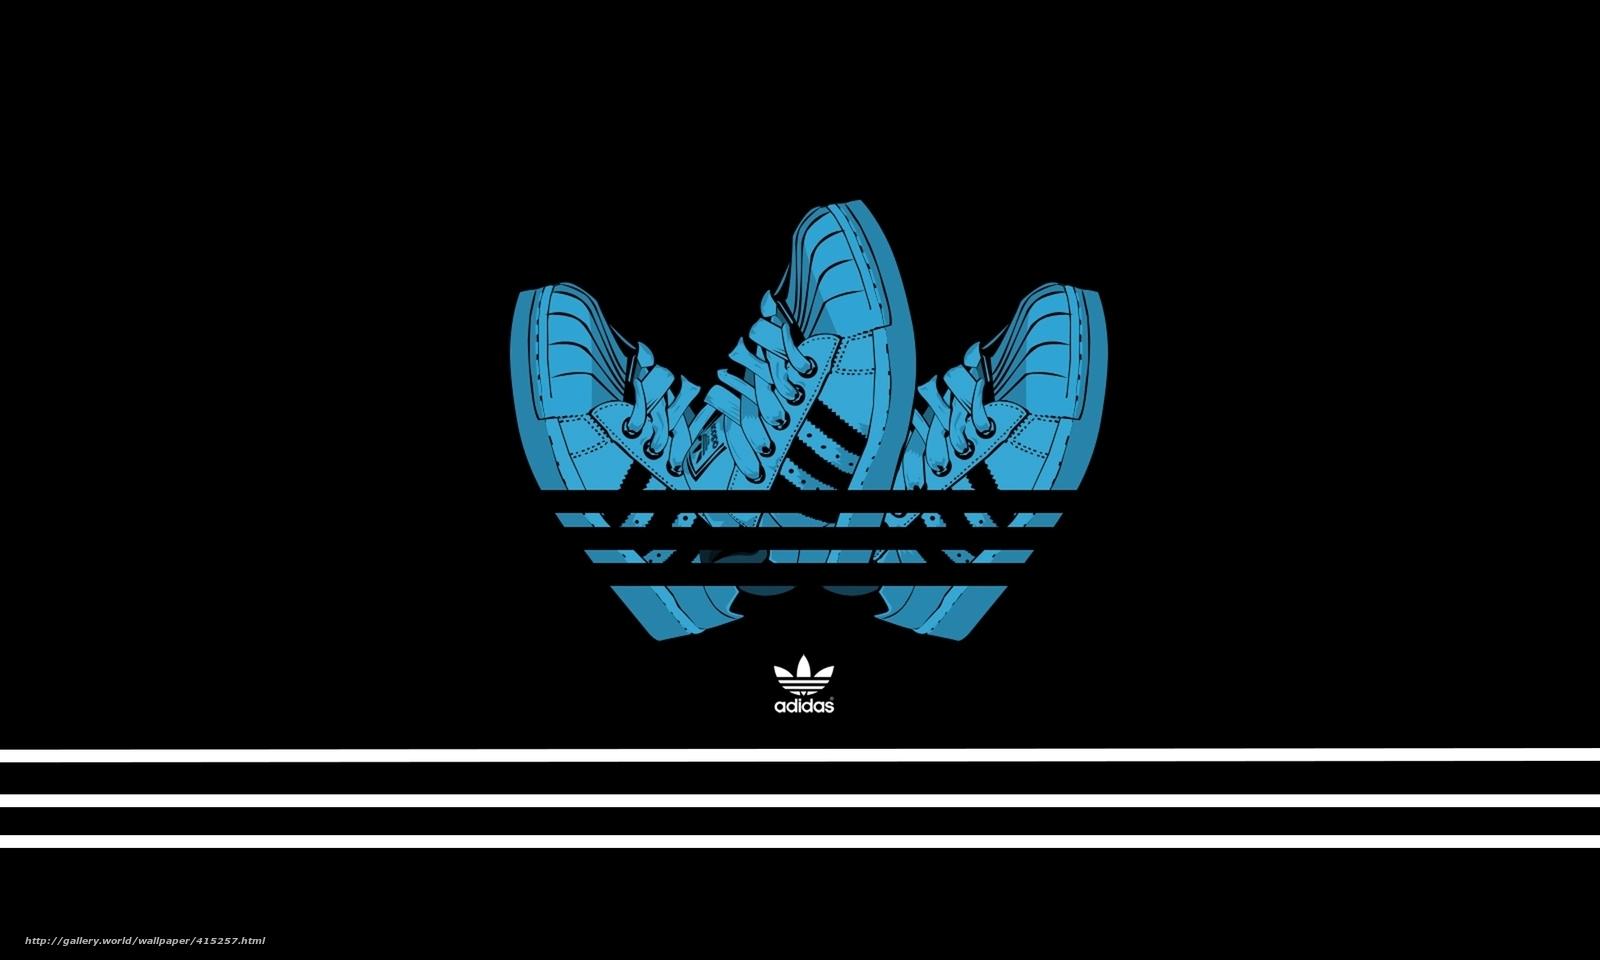 Adidas Creative Logo Design HD wallpaper.